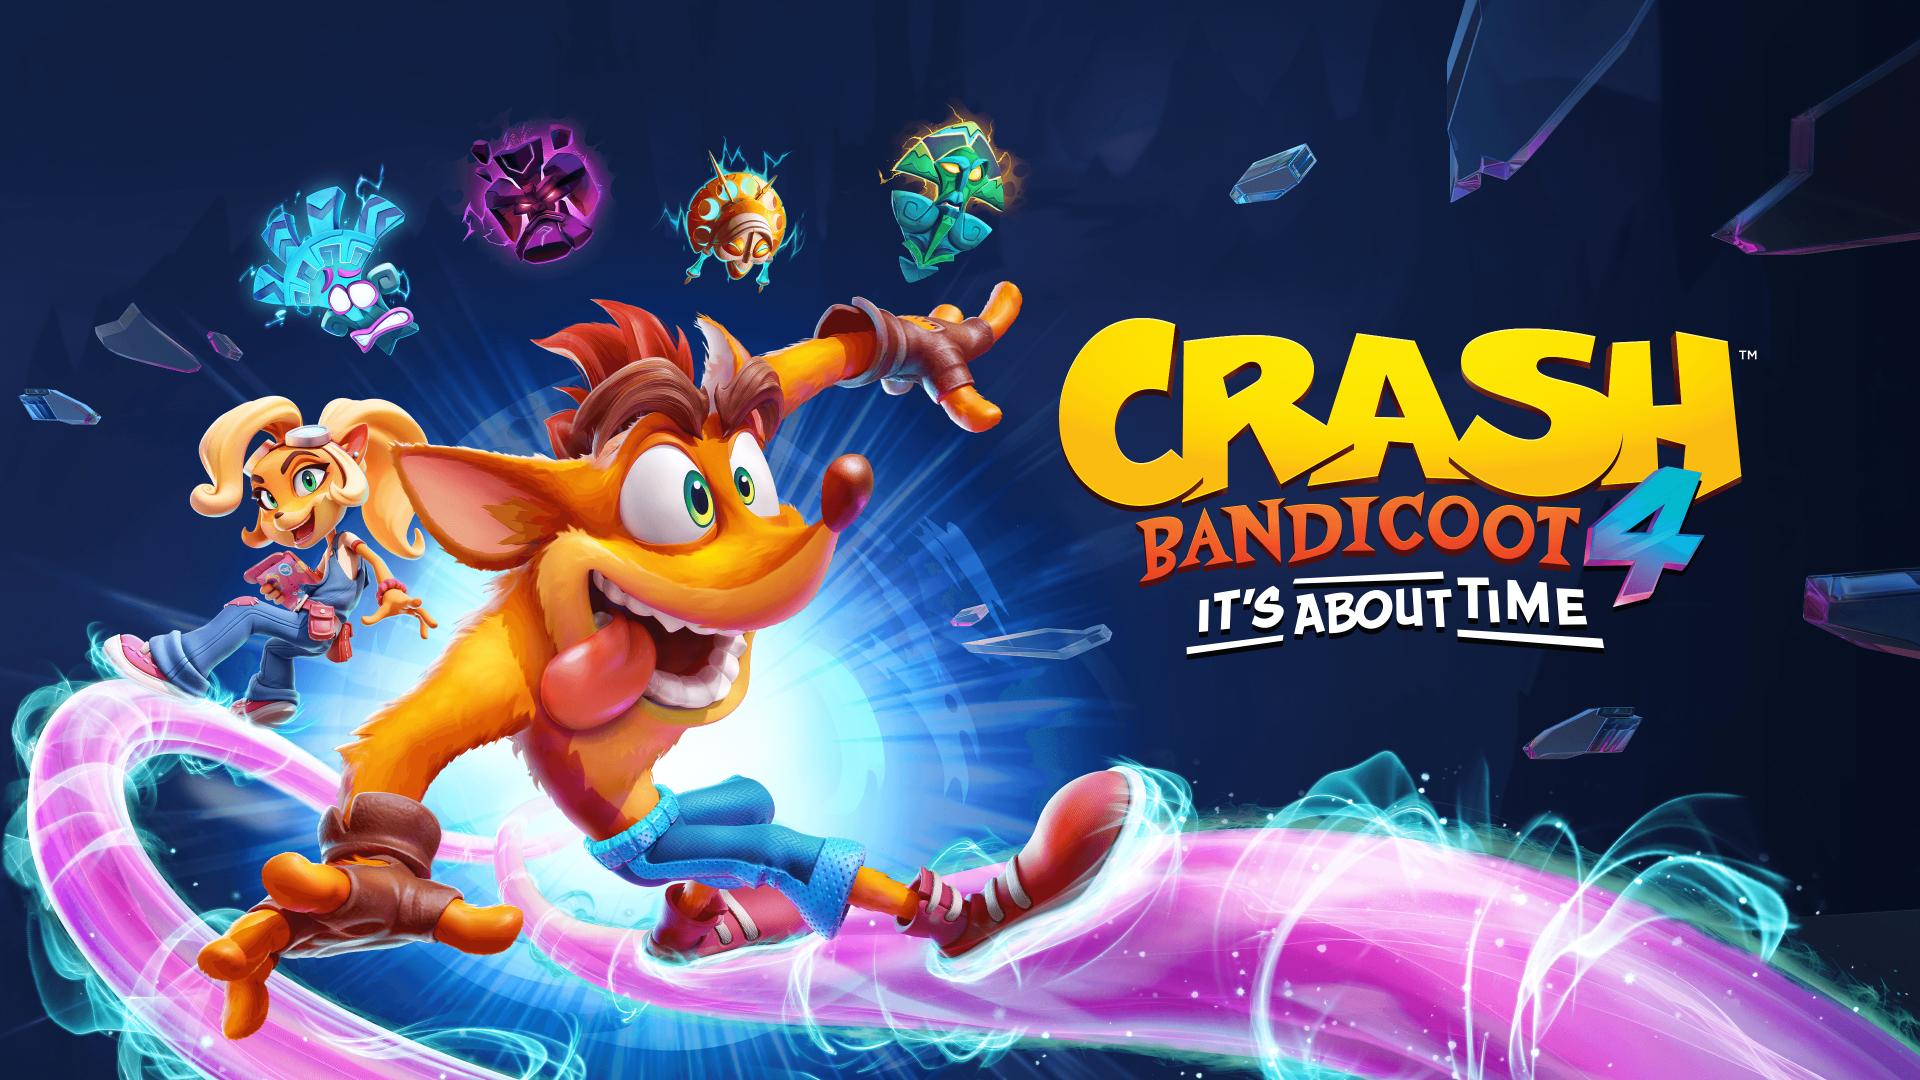 Crash Bandicoot 4, It's About Time